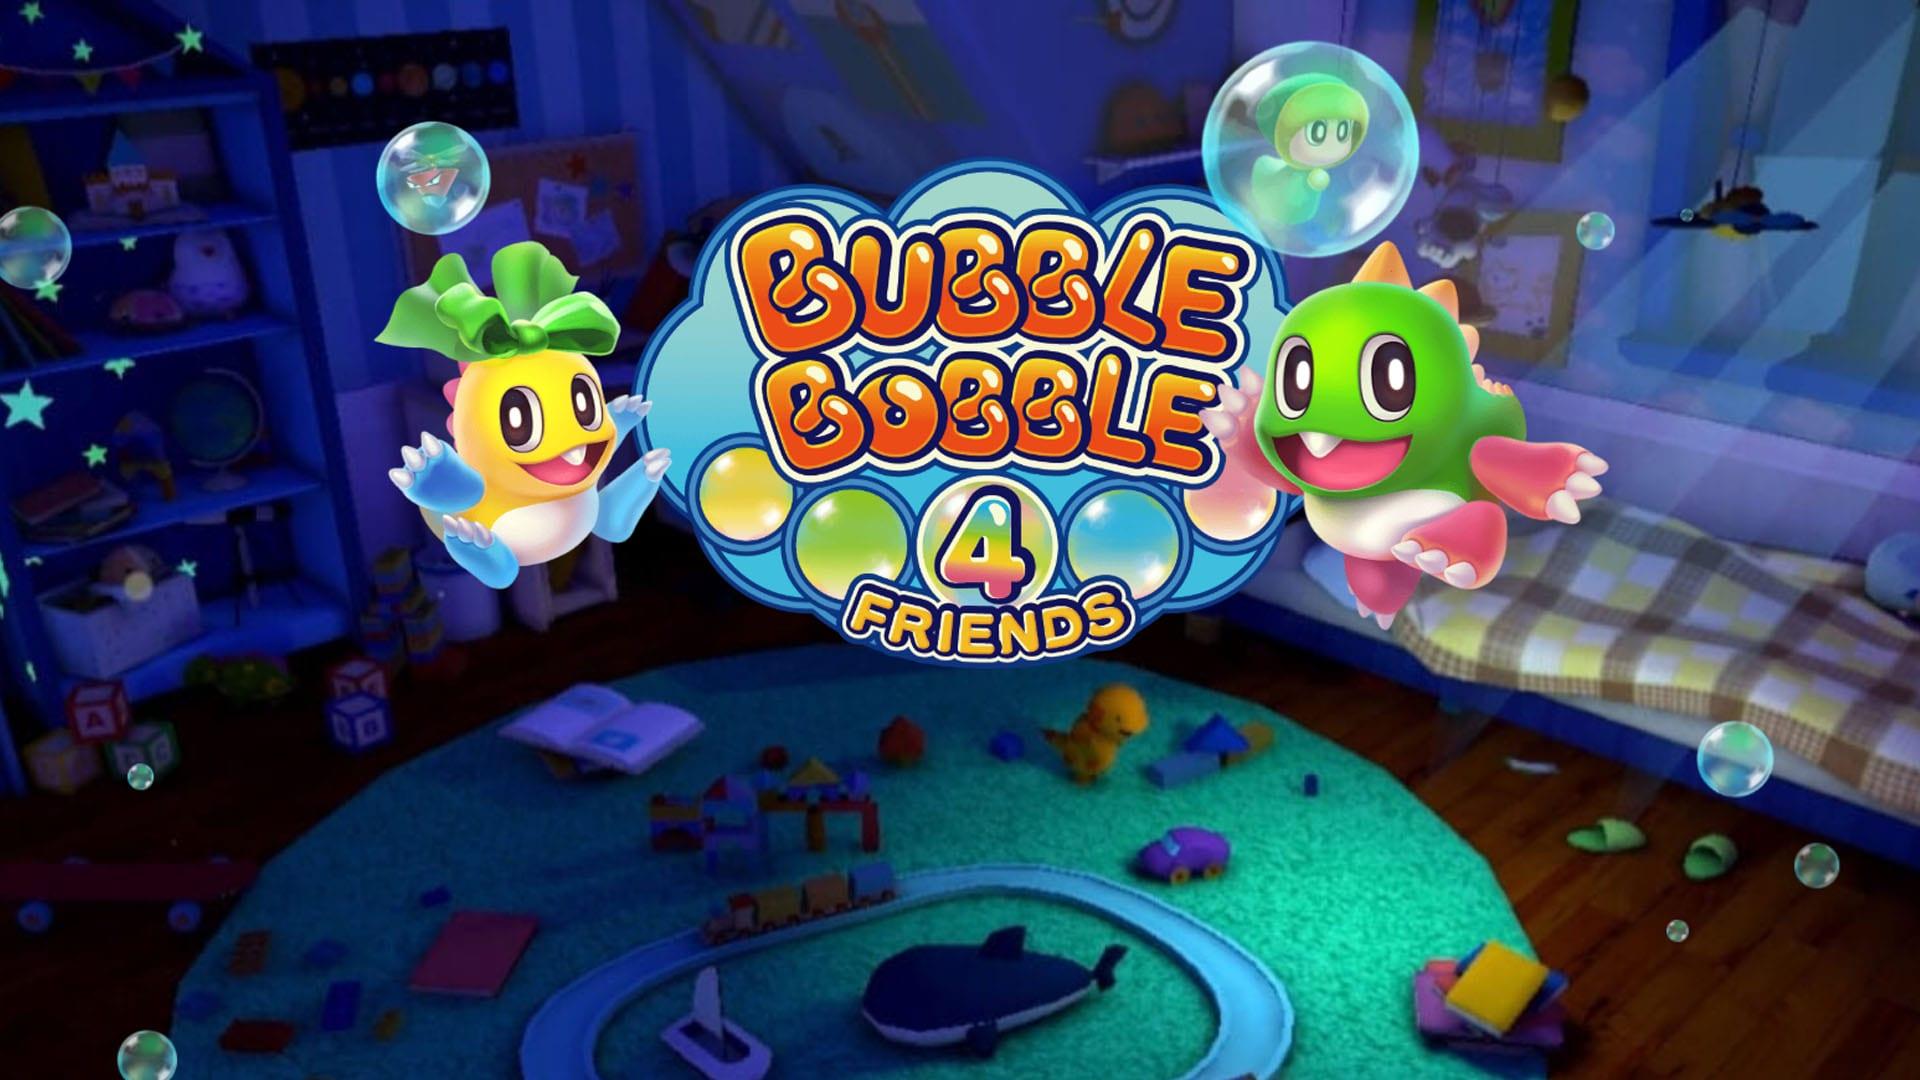 square enix presents, bubble bobble 4